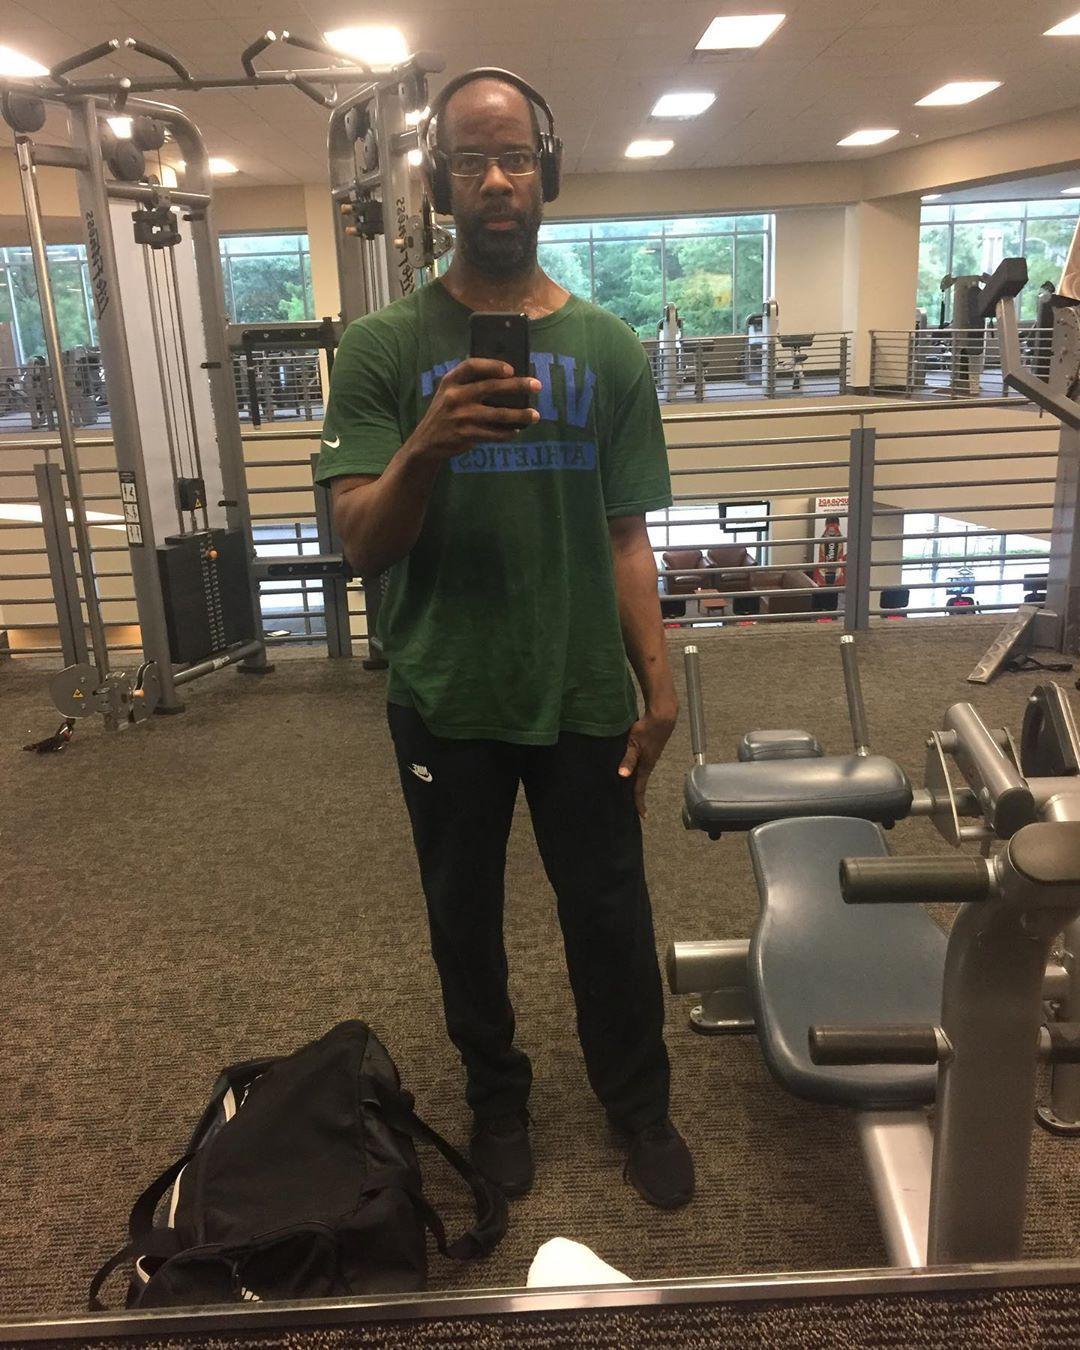 Leg Day #fitness #ebonyfitness  #workout  #workoutmotivation #melaninfitness  ...